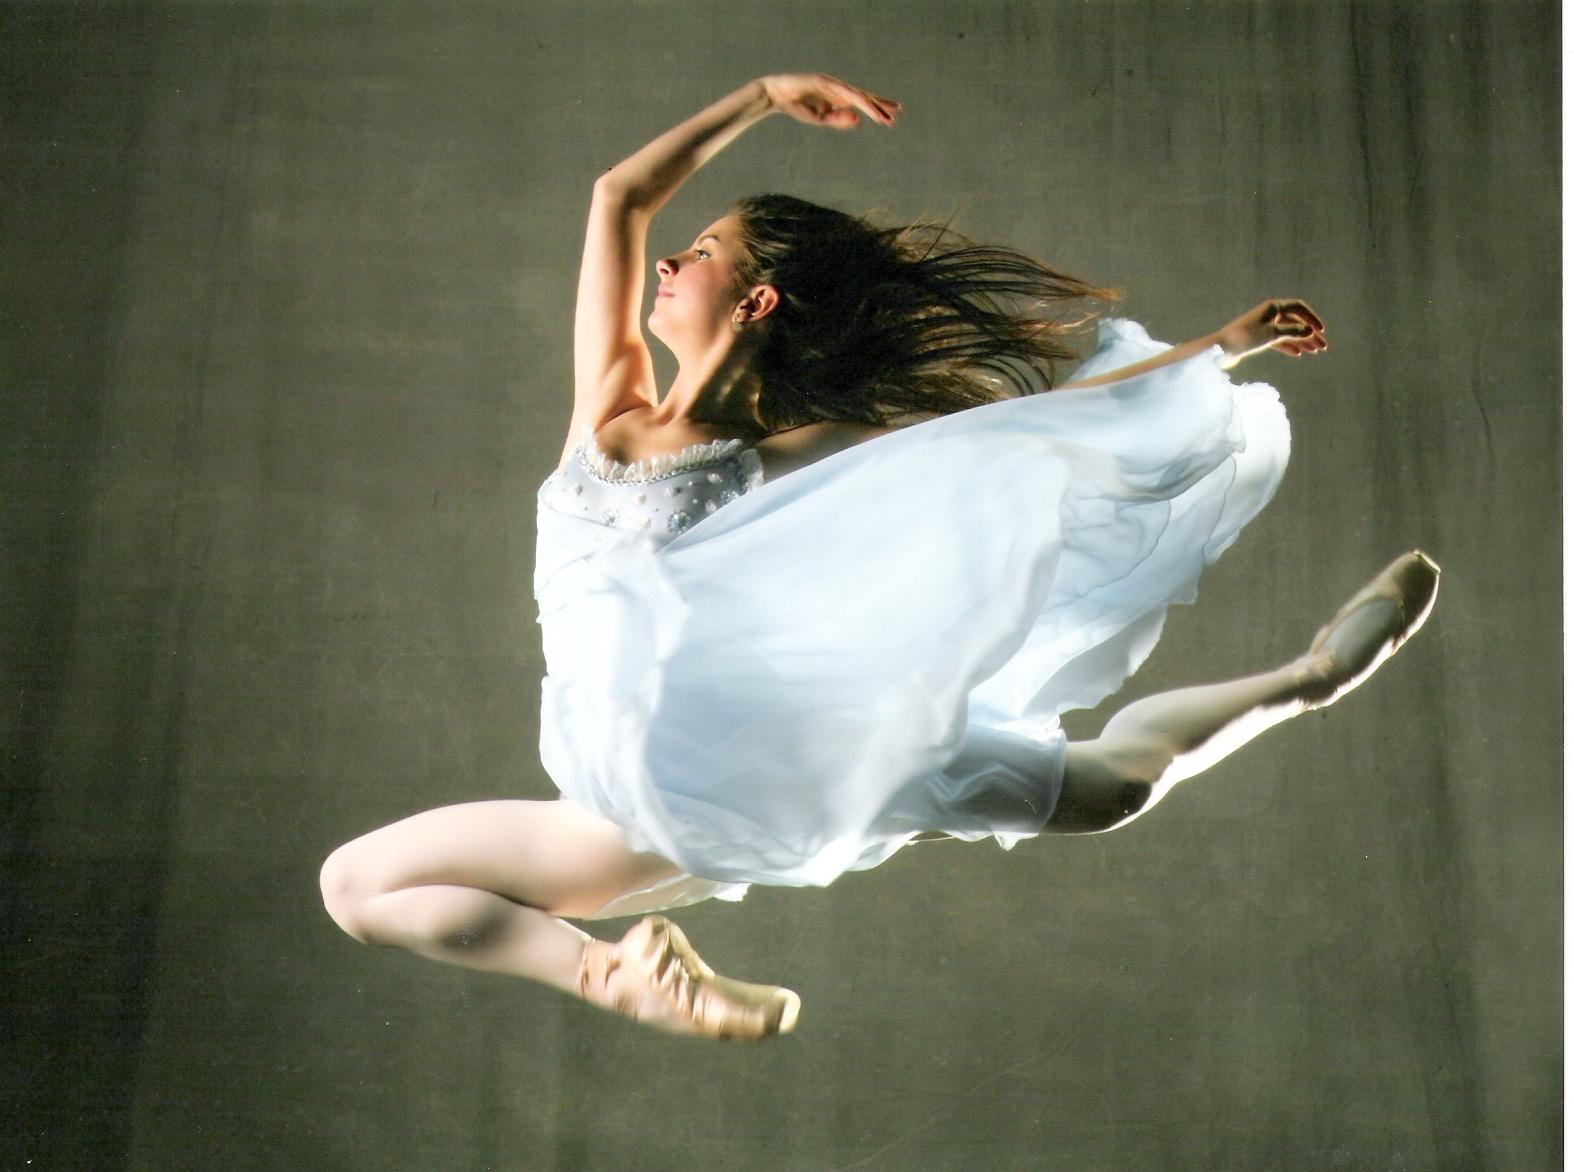 Chelsea Portelli